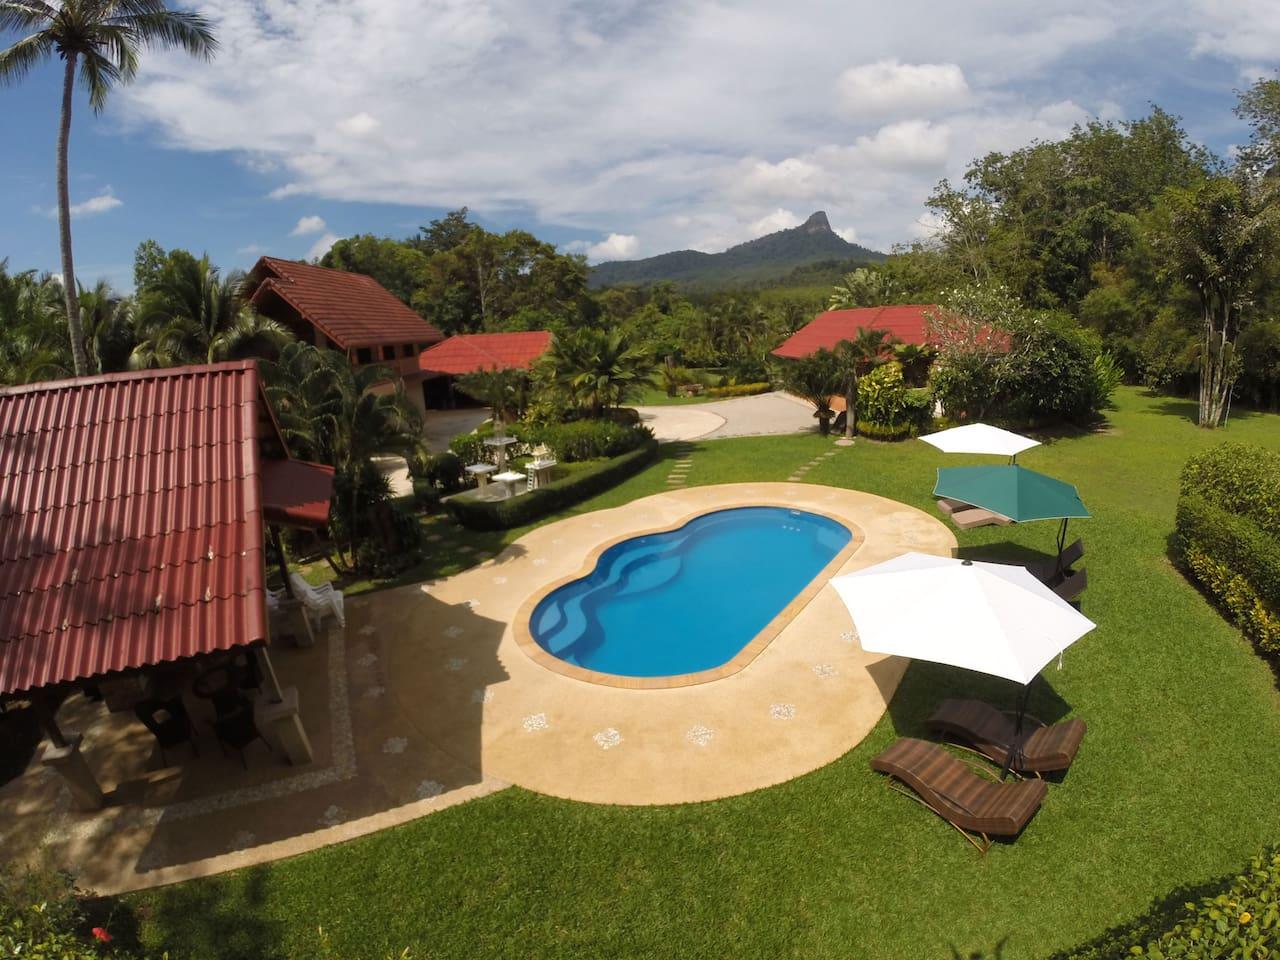 cliffside lagoon zipline villa yoga villas for rent in ao nang